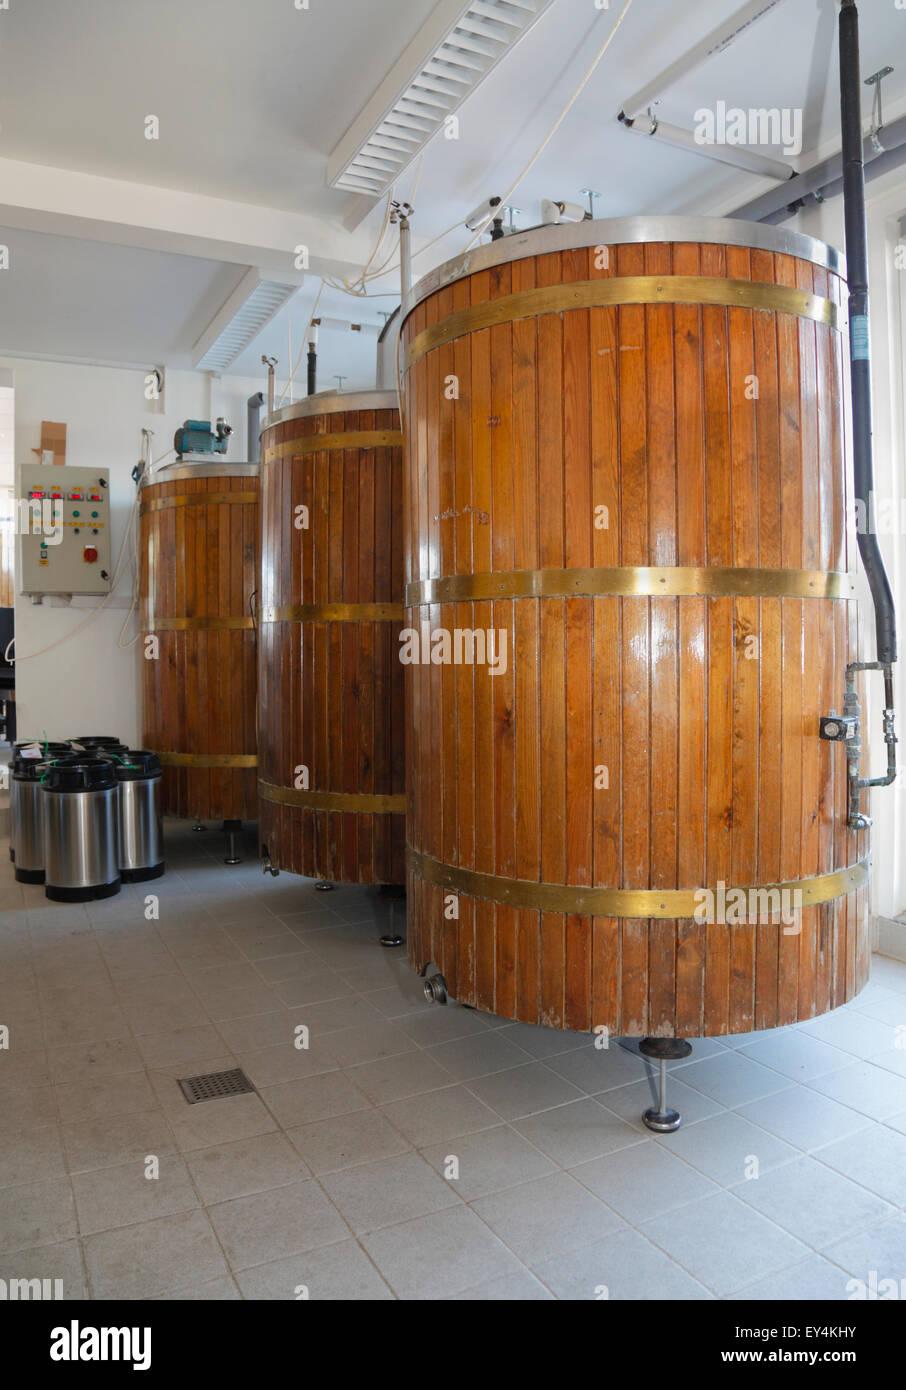 Beer barrels at Halsnæs Bryghus, a local microbrewery, Hundested Harbour, Zealand, Denmark - Stock Image